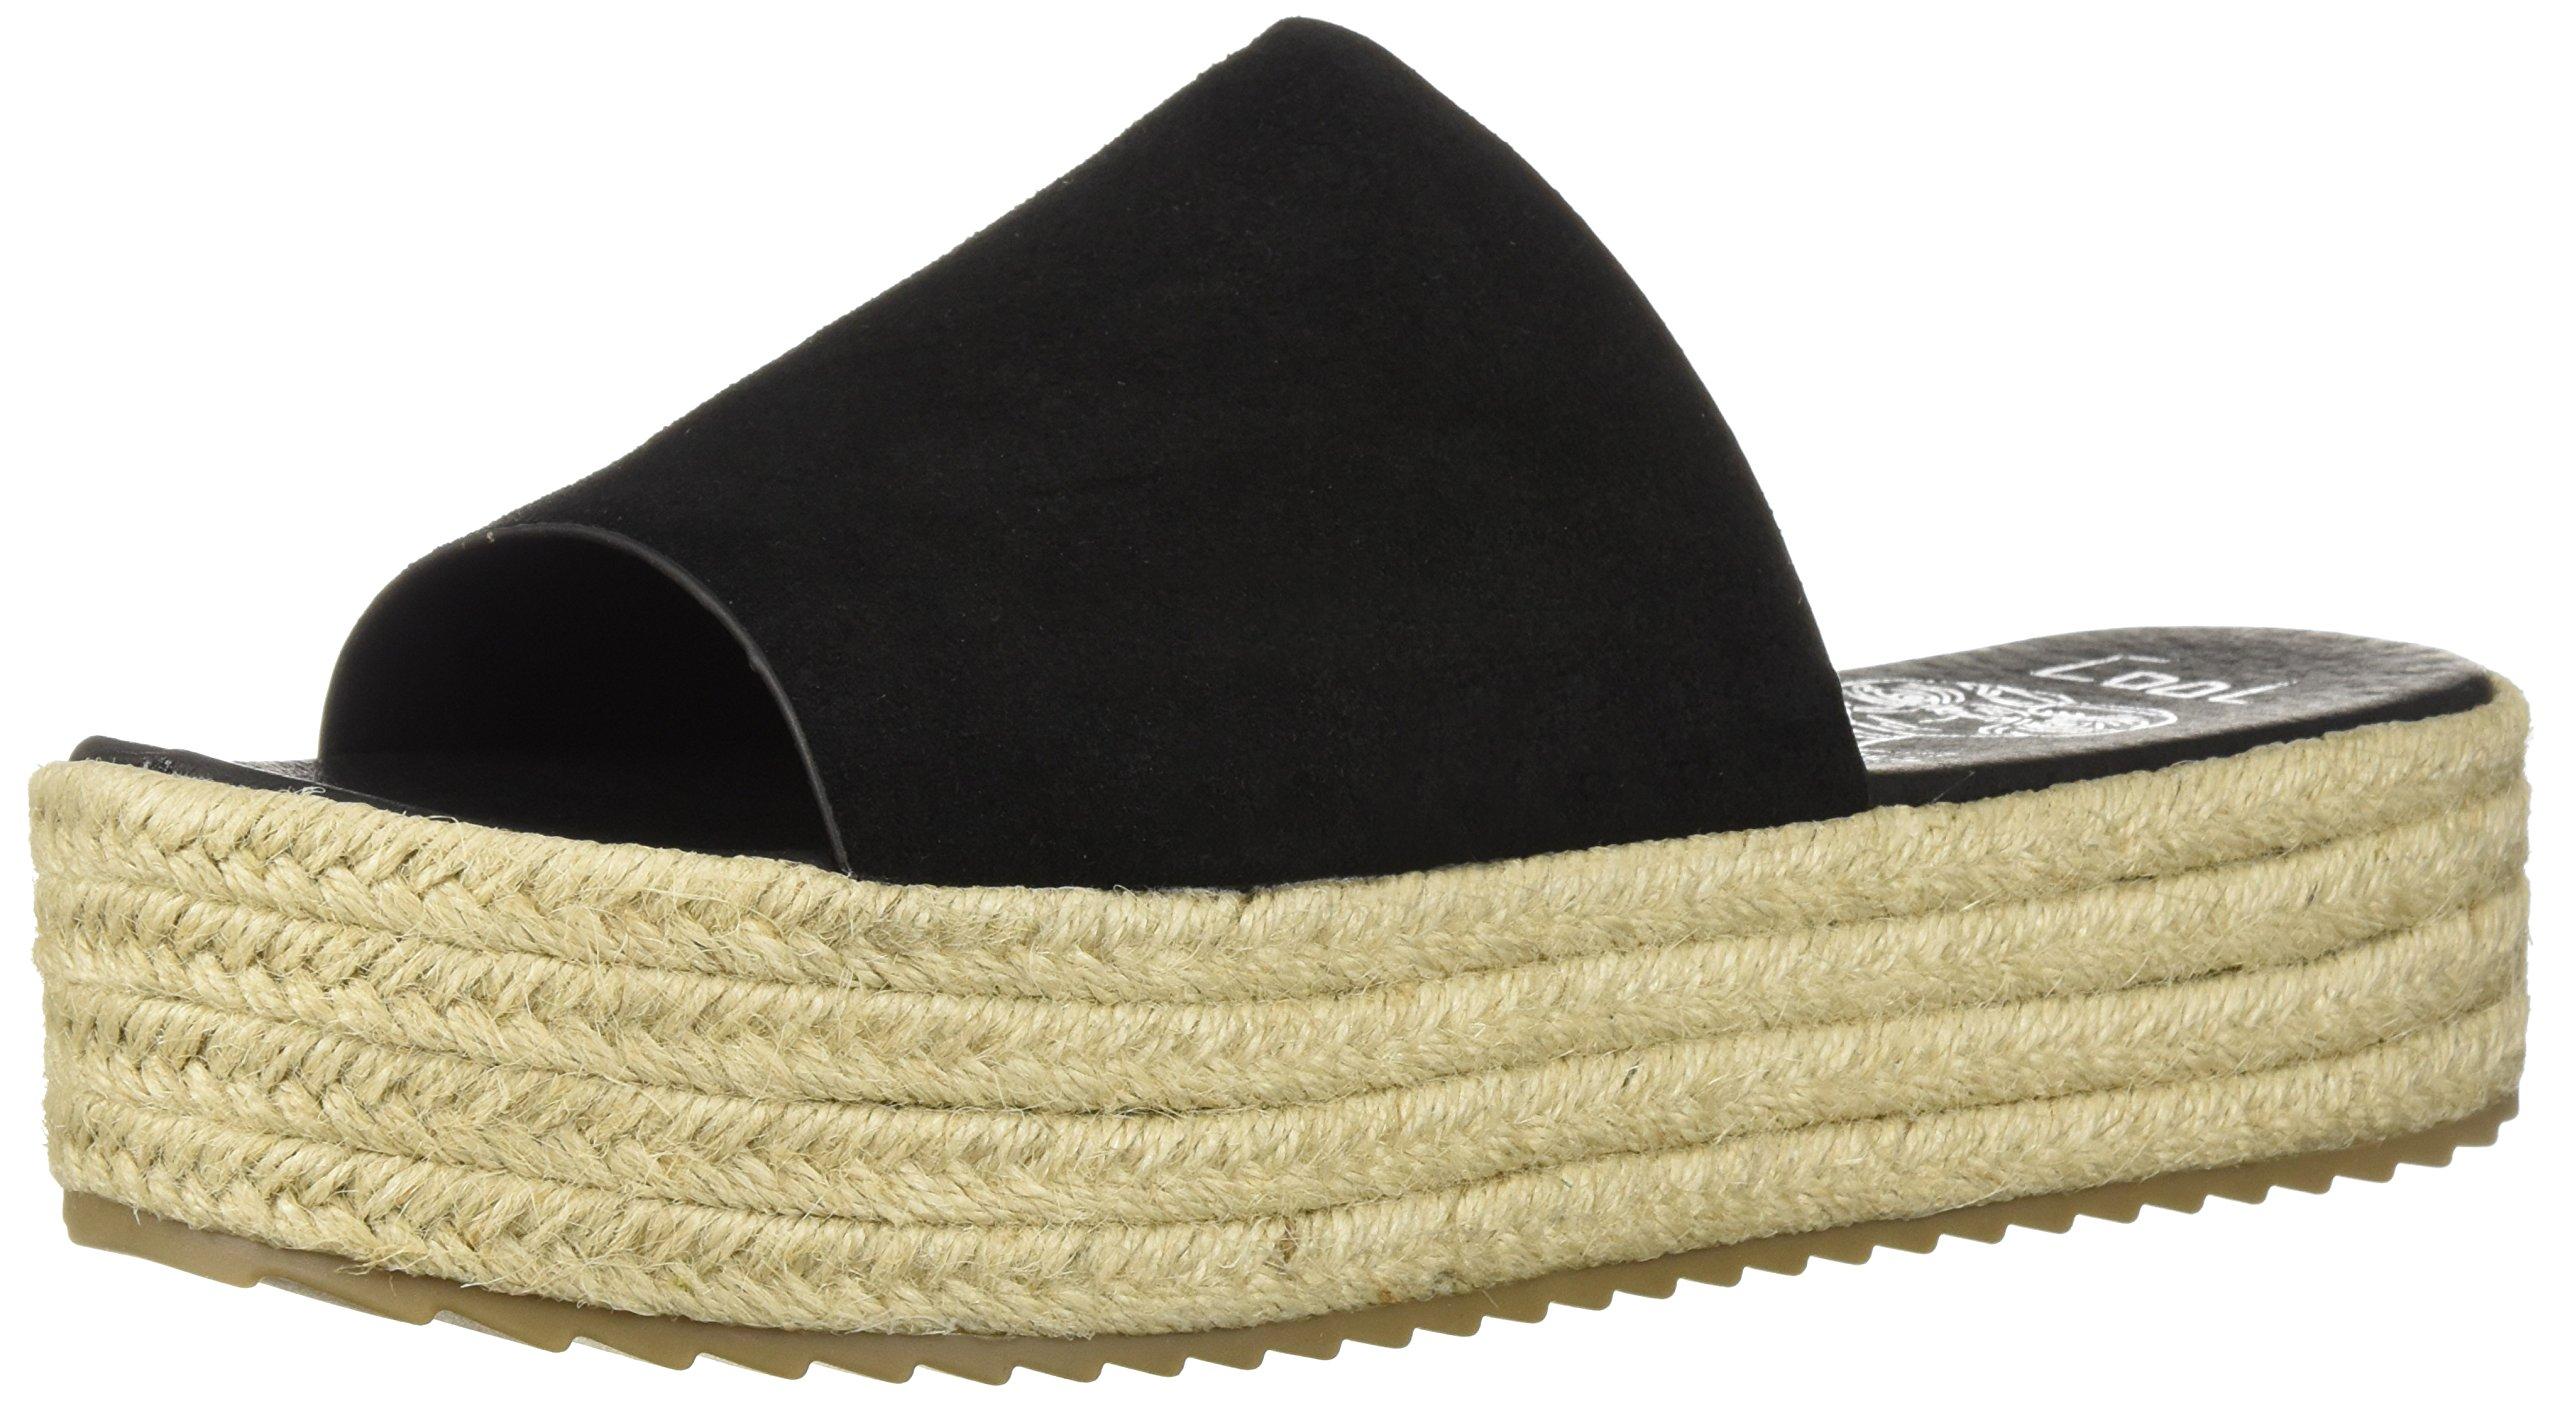 Coolway Women's BORY Espadrille Wedge Sandal, Black, 38 Medium EU (7-7.5 US)